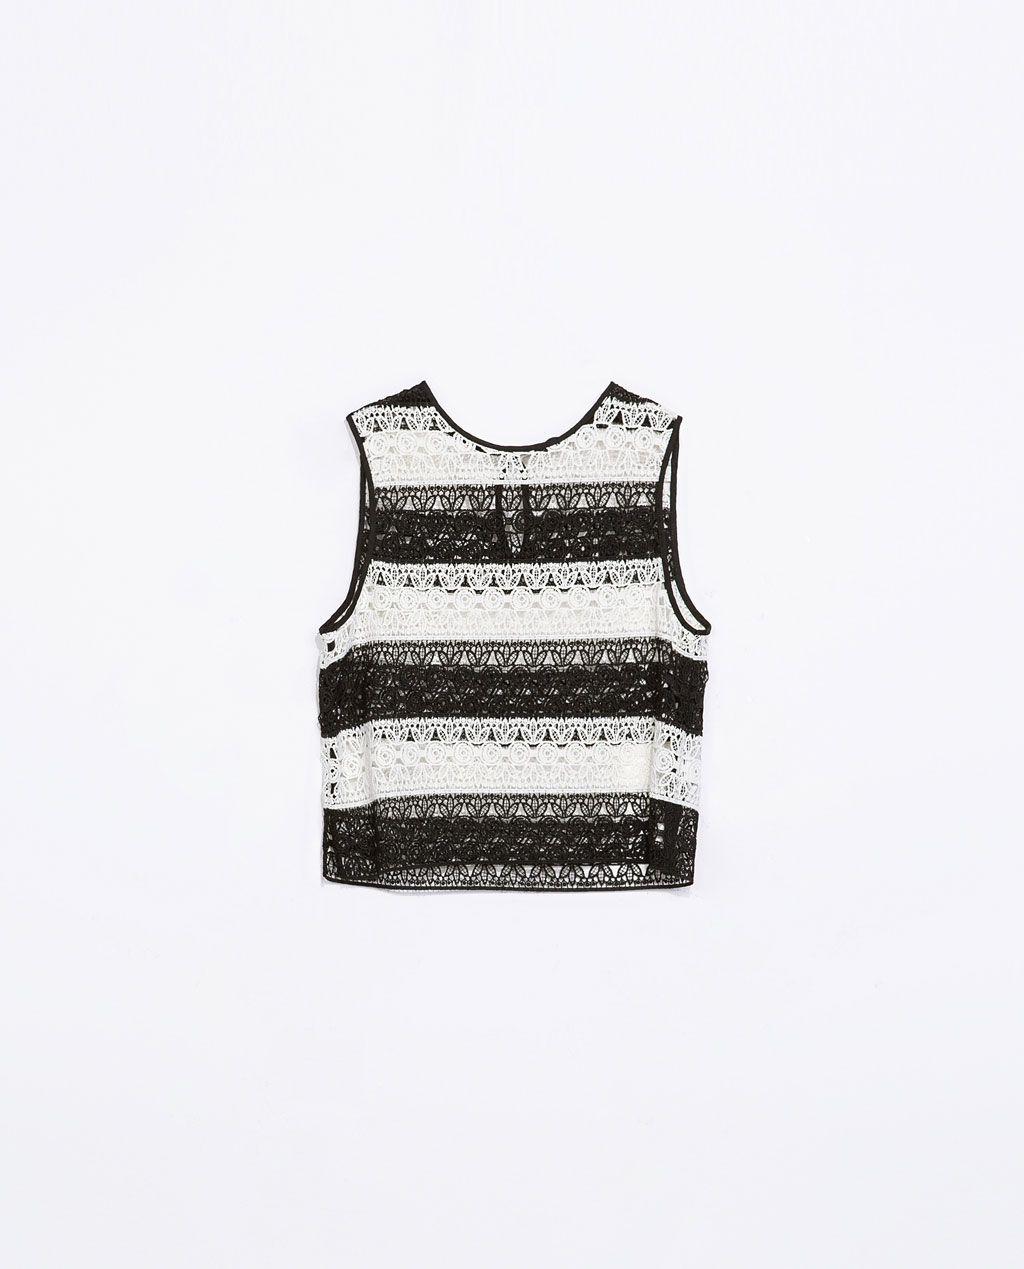 #TOP #GUIPUR #RAYAS #BICOLOR @· ZARA · 29.95€ #moda #primavera #tendencia